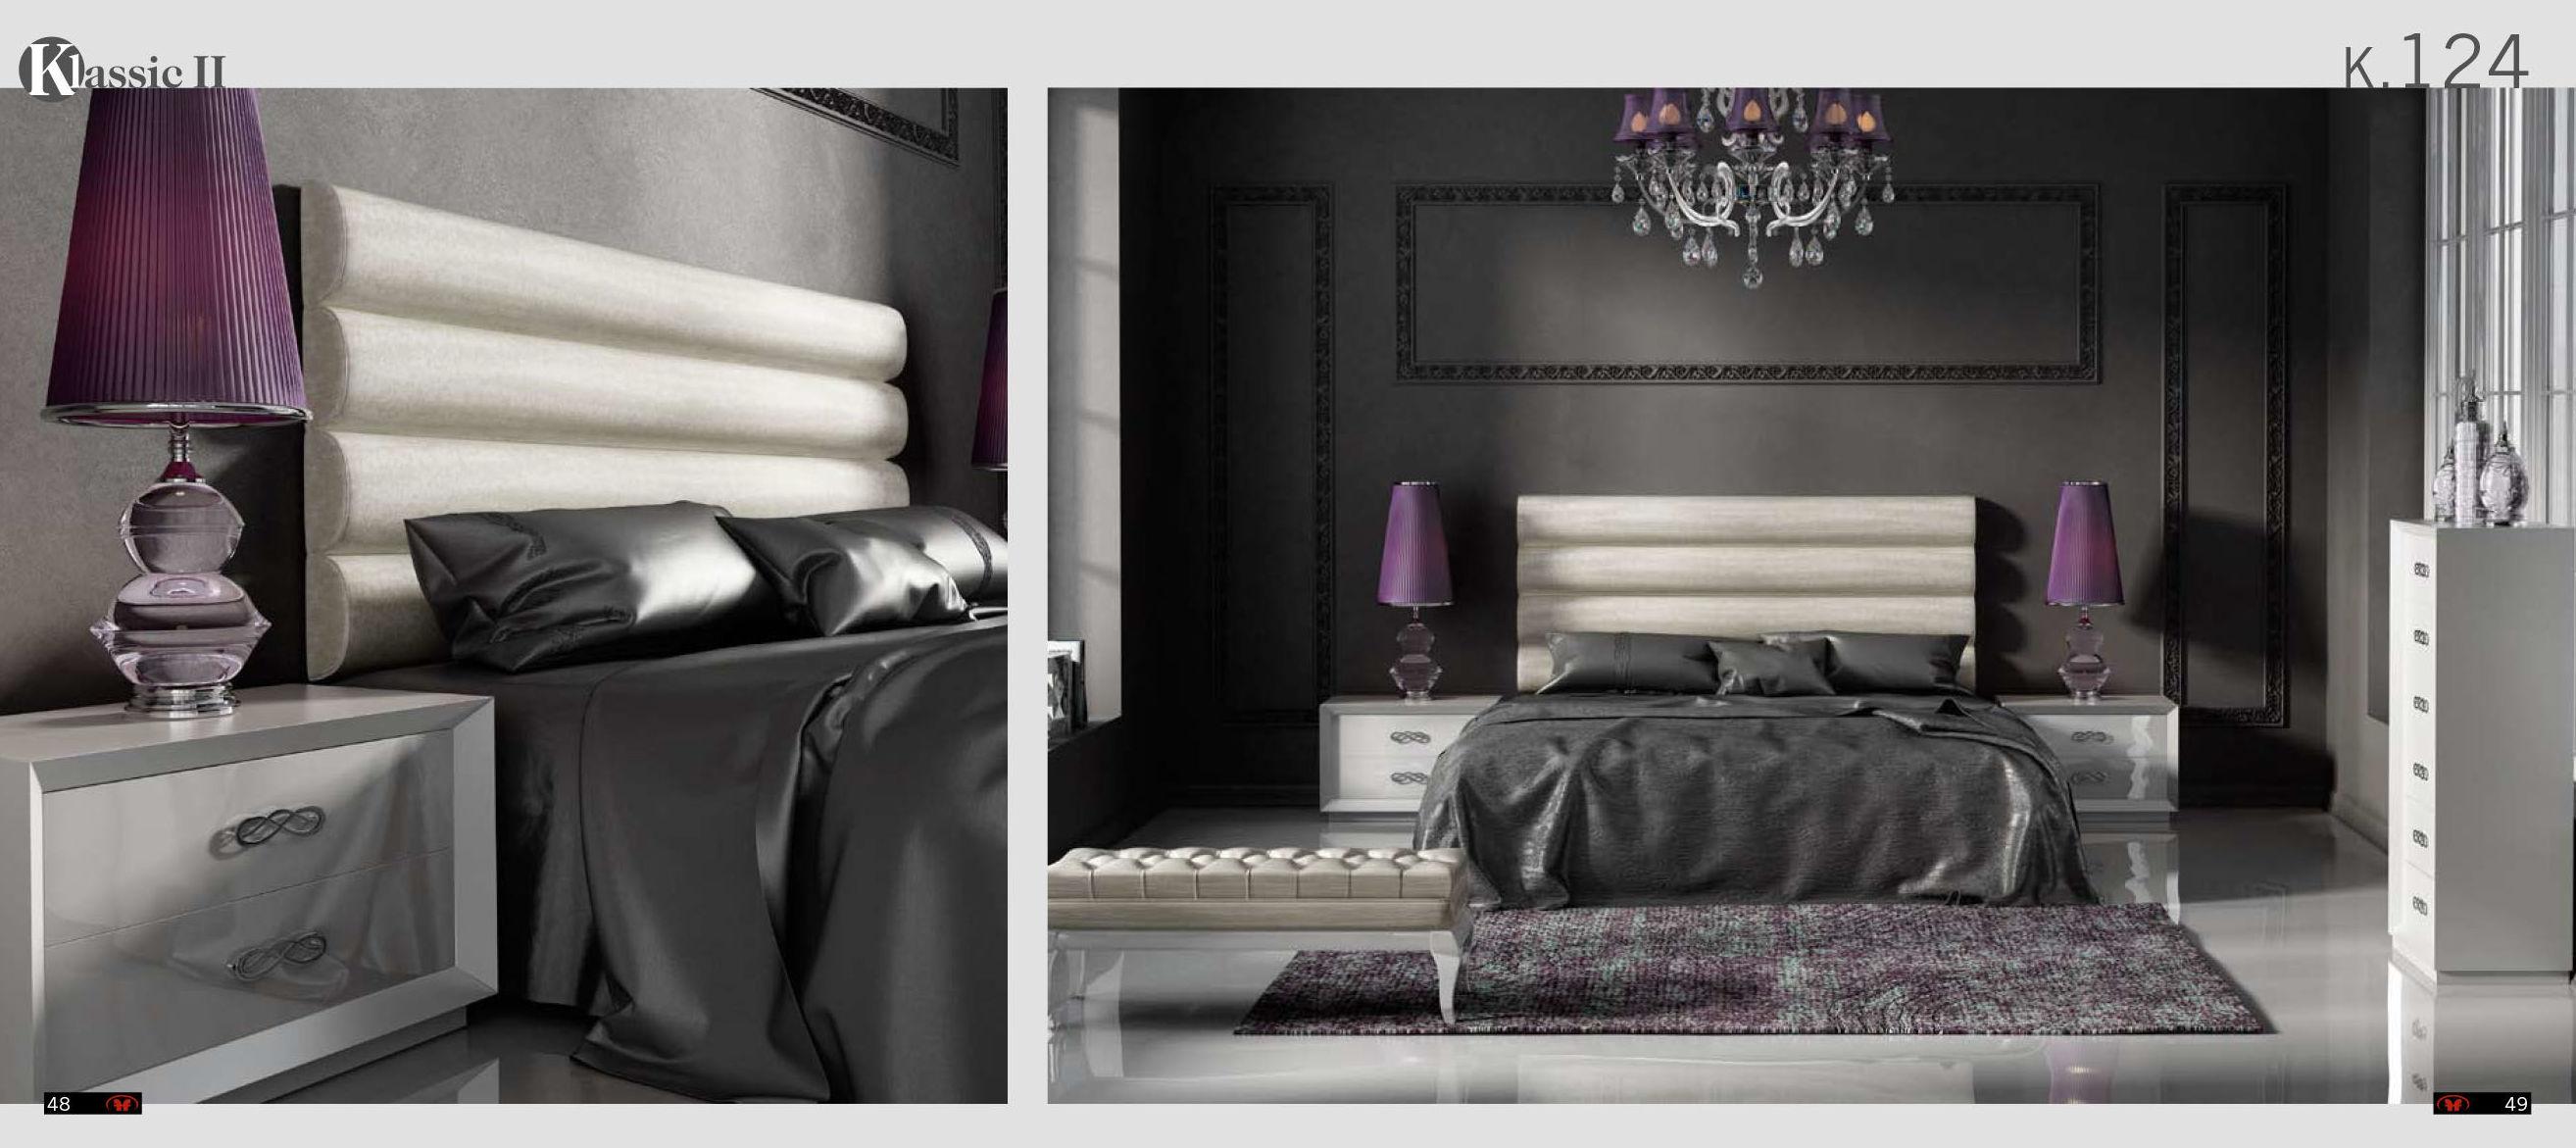 Franco furniture colecci n klassic 2 cat logo de muebles - Muebles y complementos ...